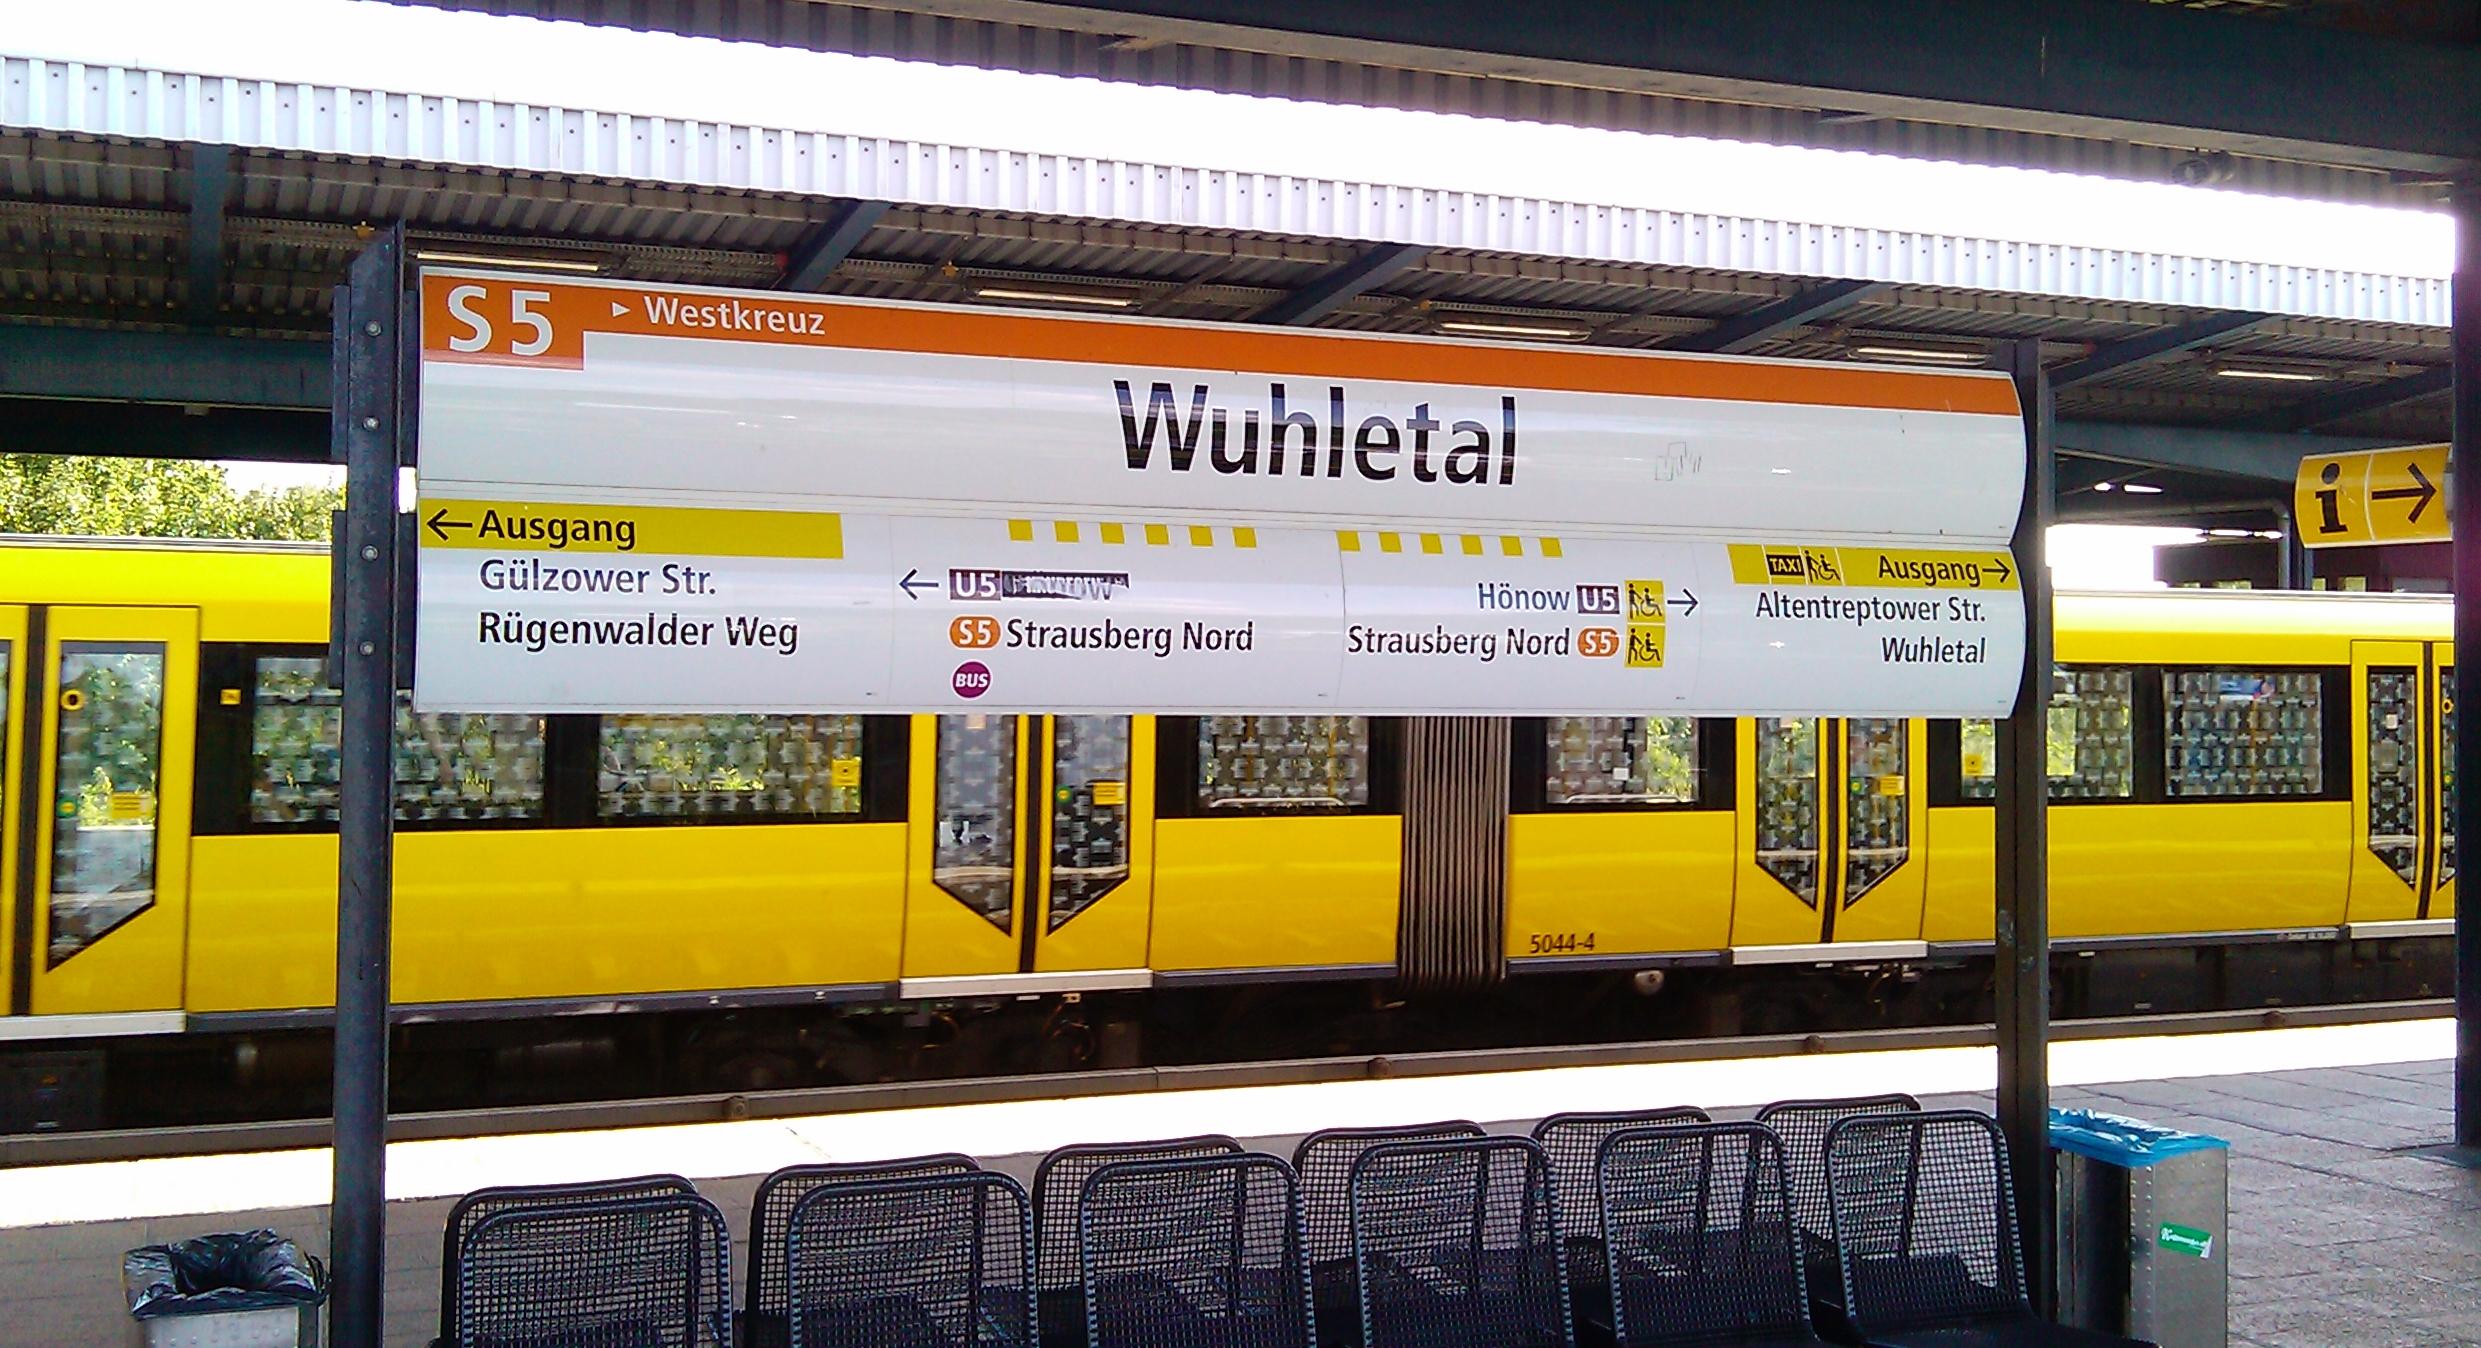 Bahnhof_Berlin-Wuhletal_Station_Sign_of_S-Bahn_in_BVG_Corporate_Design